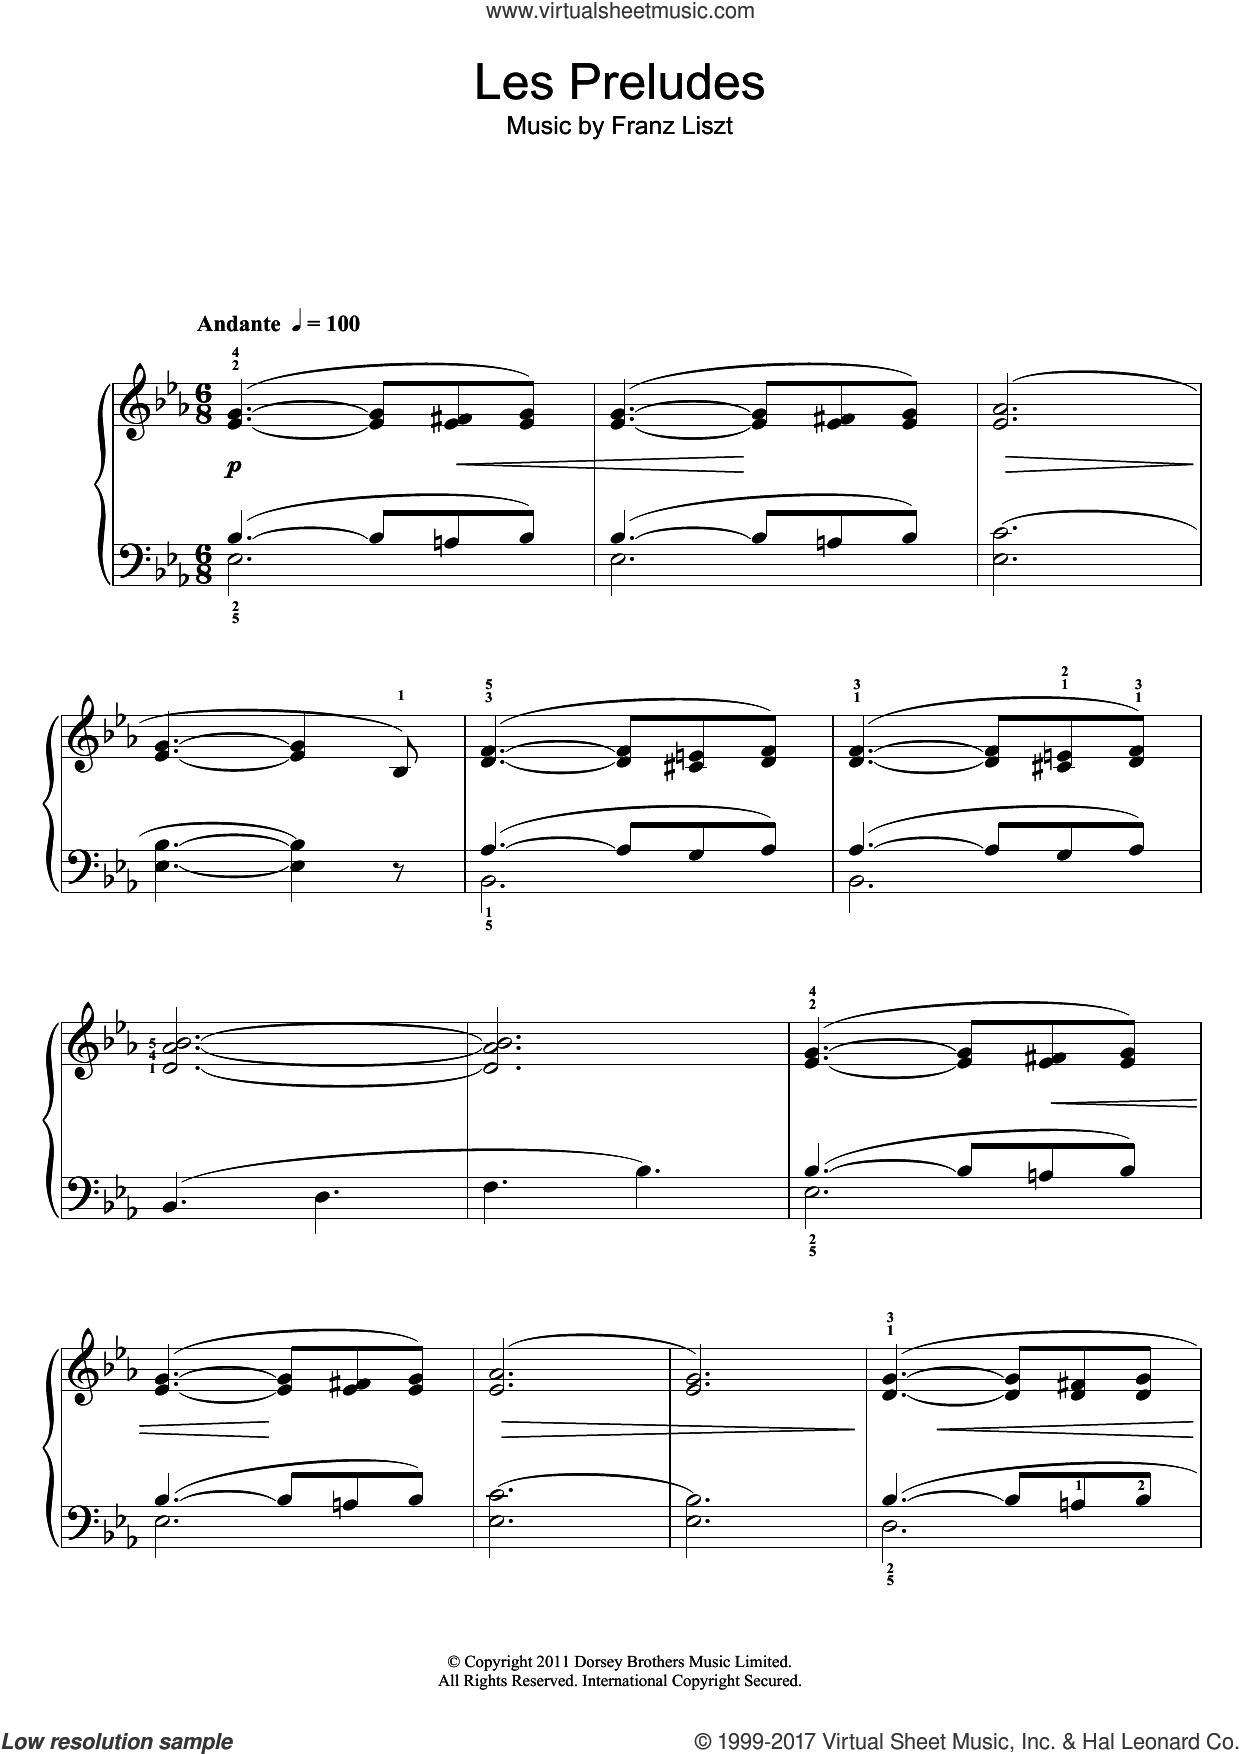 Liszt - Les Preludes sheet music for piano solo [PDF]